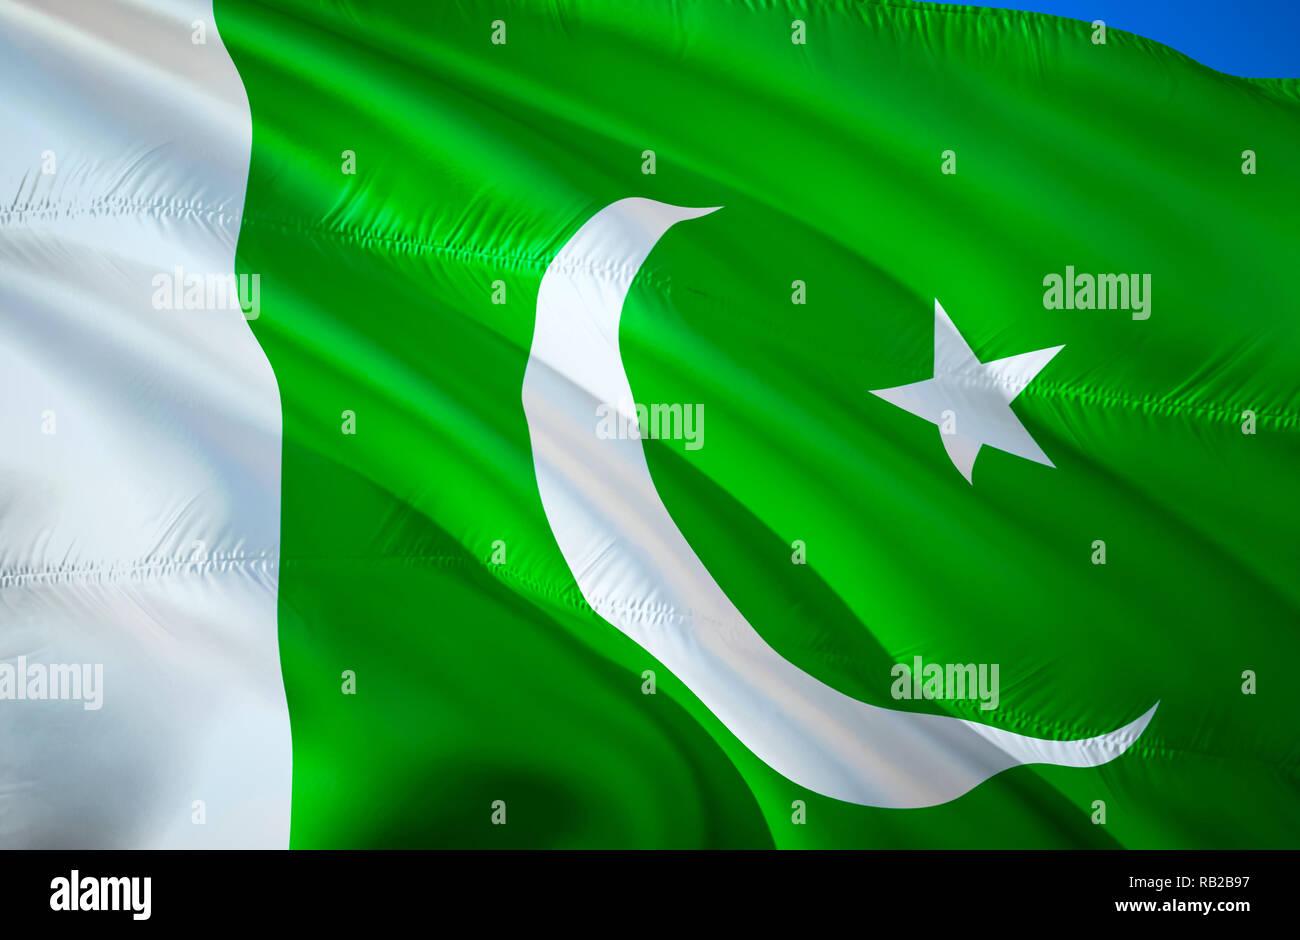 565c12e0b8 Pakistan flag. 3D Waving flag design. The national symbol of Pakistan, 3D  rendering